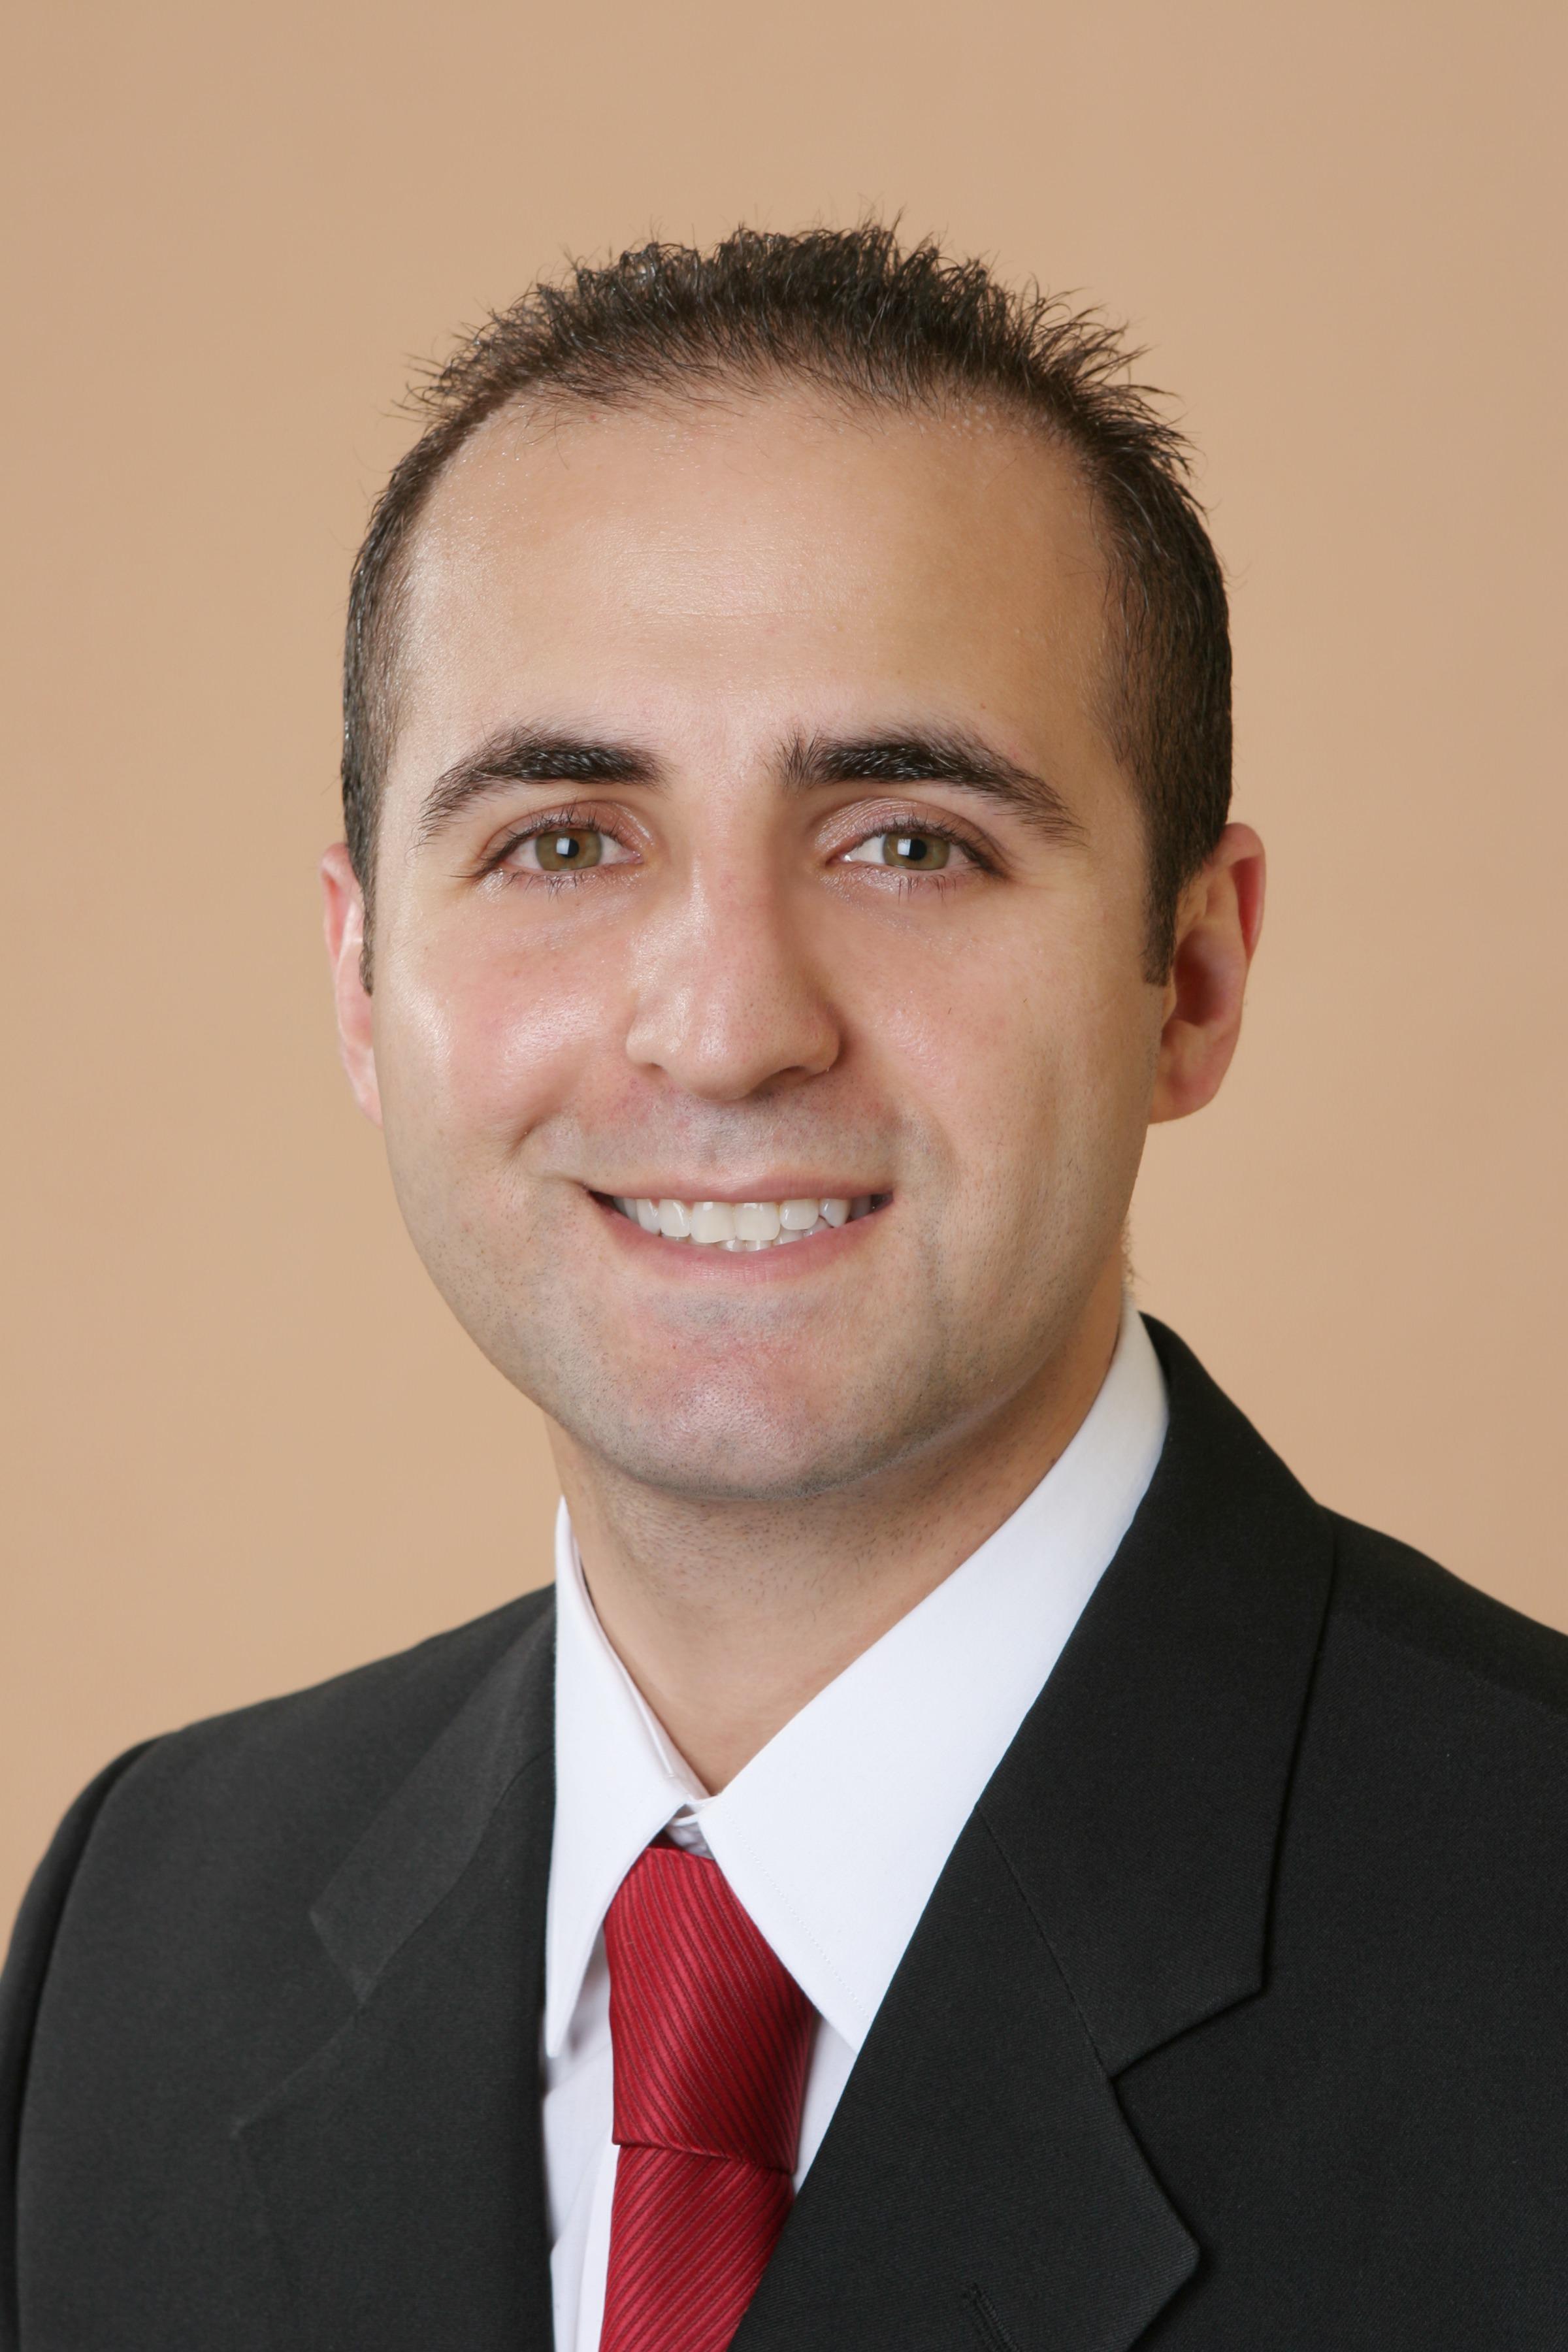 Ethan Sahinoglu